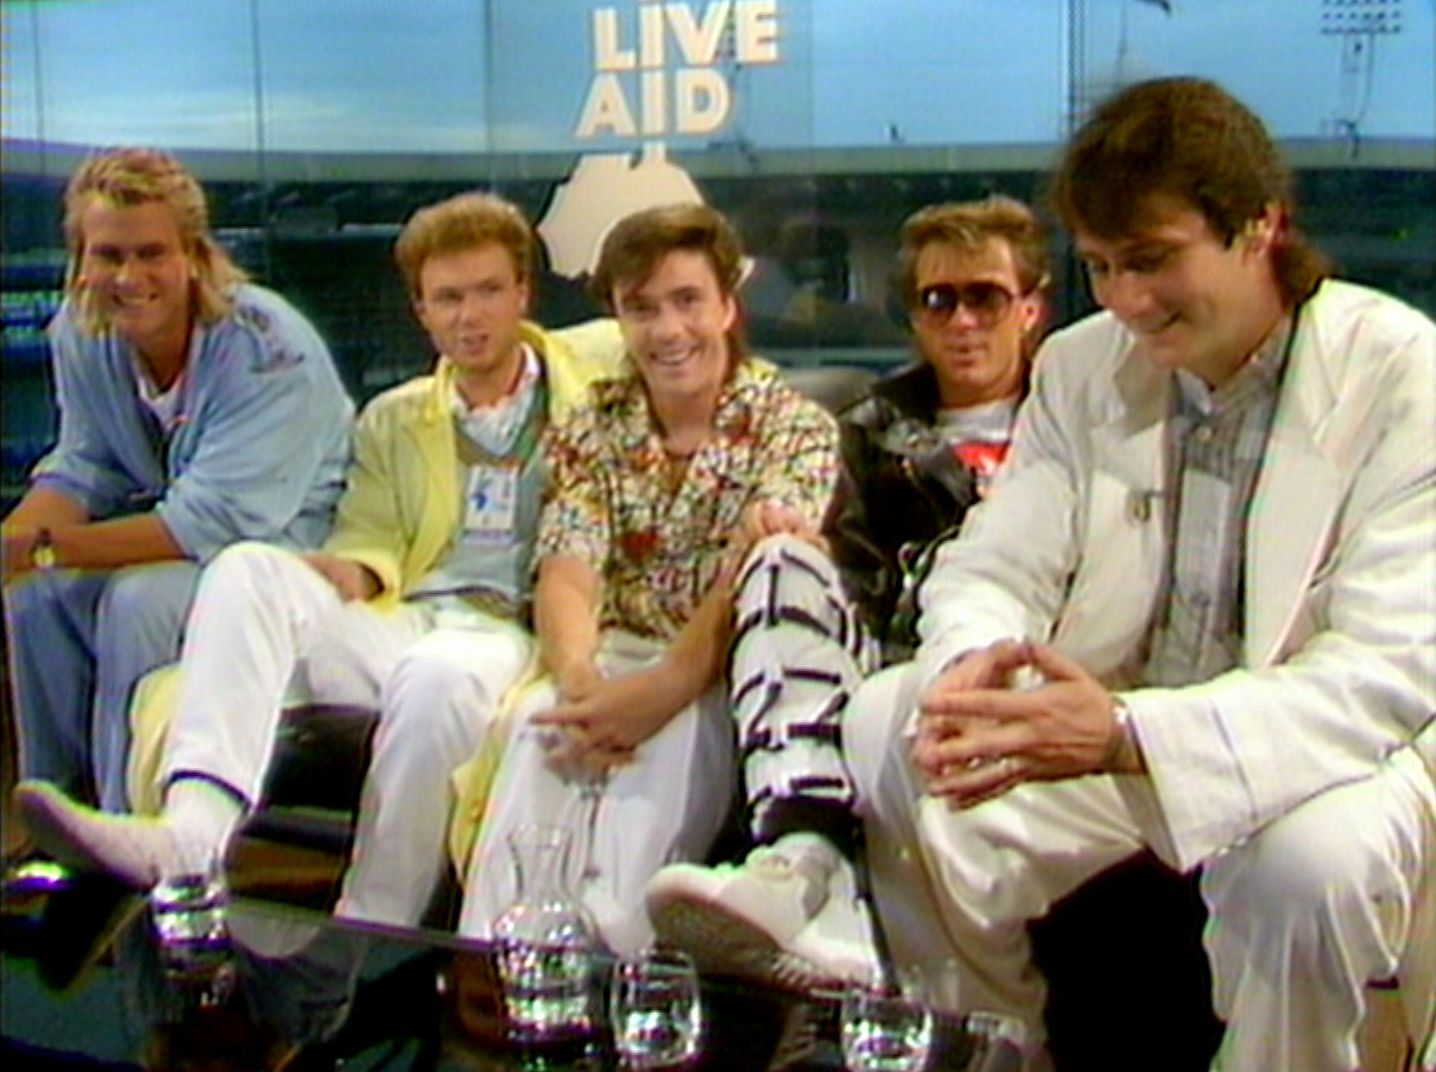 SPANDAU BALLET - Il Film - Soul Boys of the Western World: gli Spandau Ballet intervistati durante il Live Aid